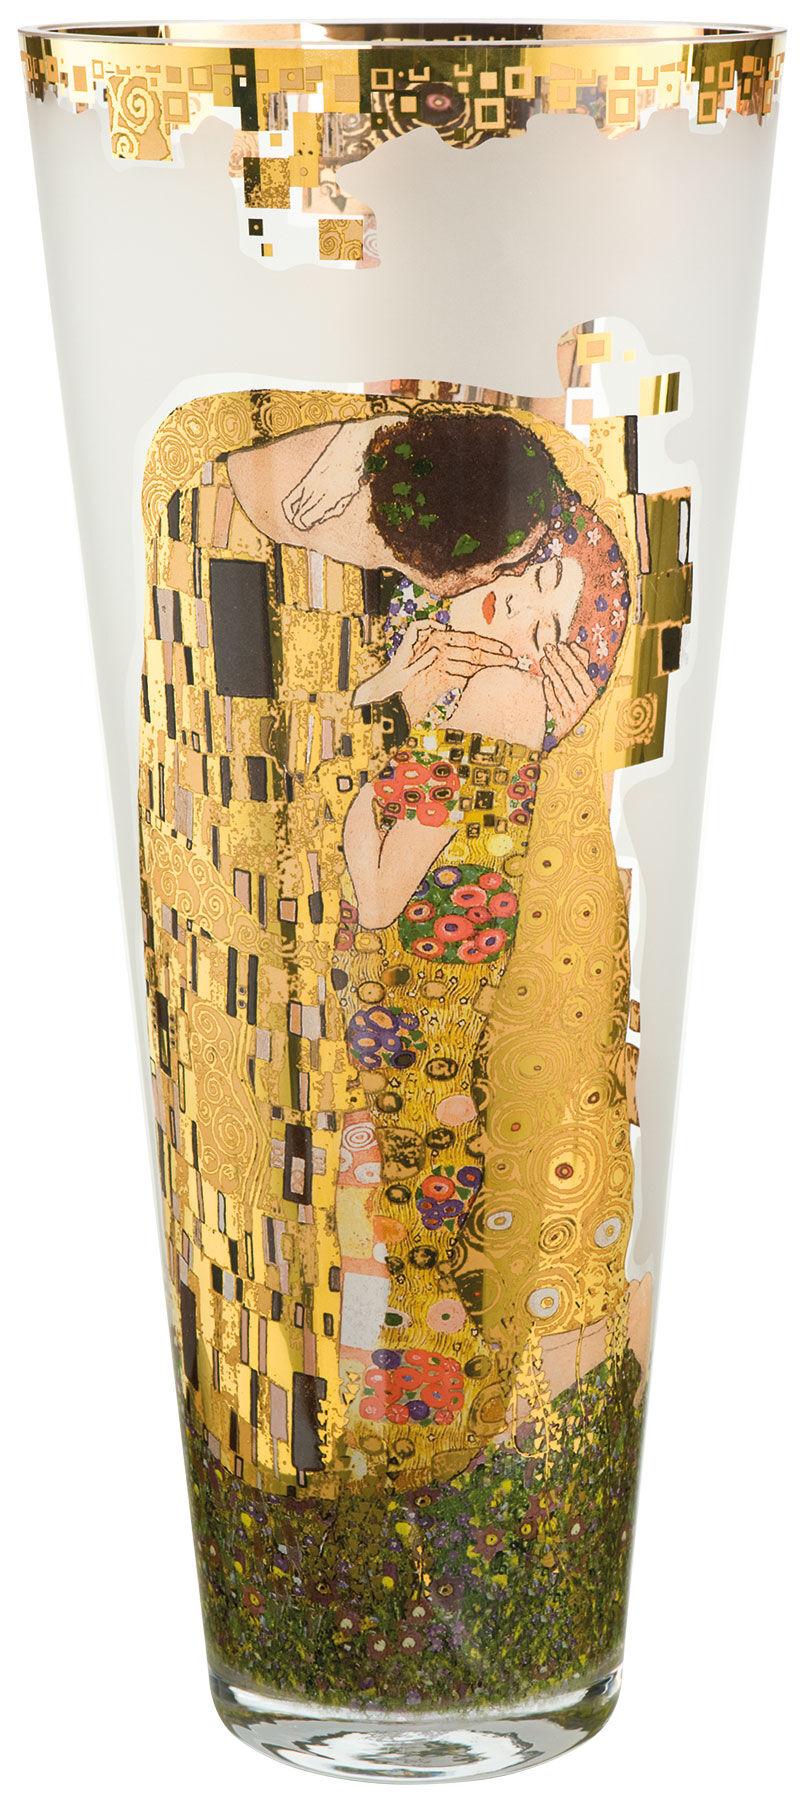 Gustav klimt glass vase the kiss with gold decor ars mundi gustav klimt glass vase the kiss with gold decor reviewsmspy